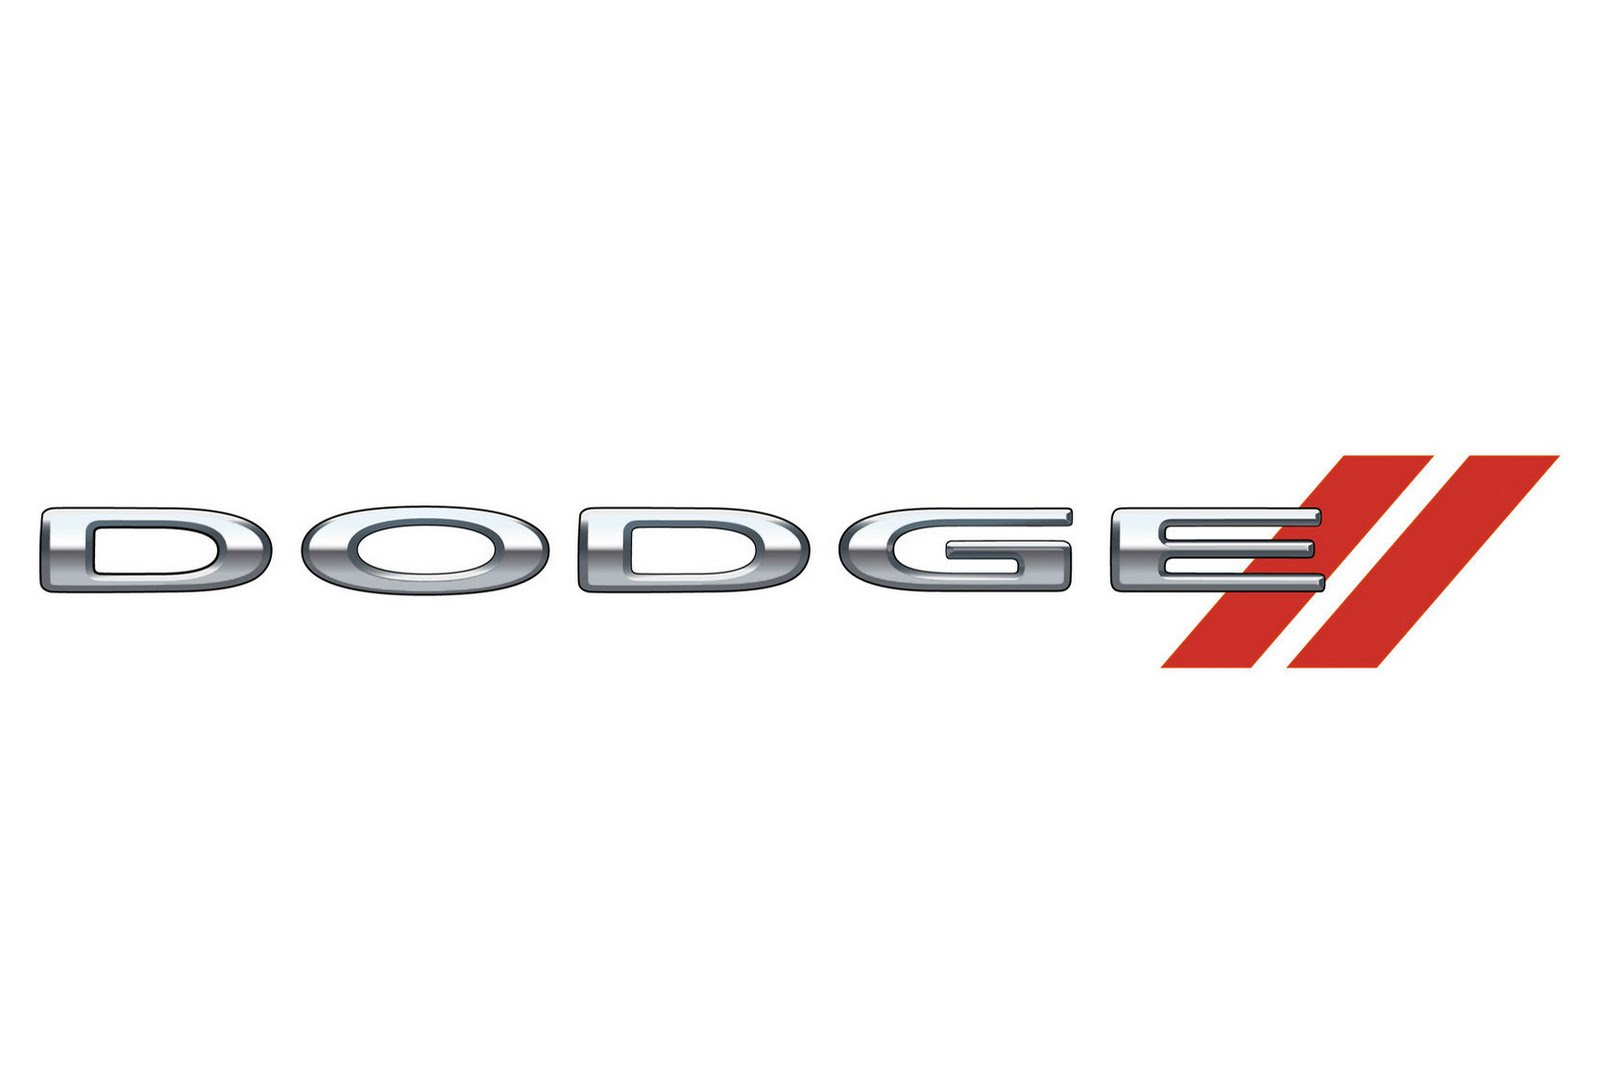 Dodgeredrhombus on Dodge Durango Fire